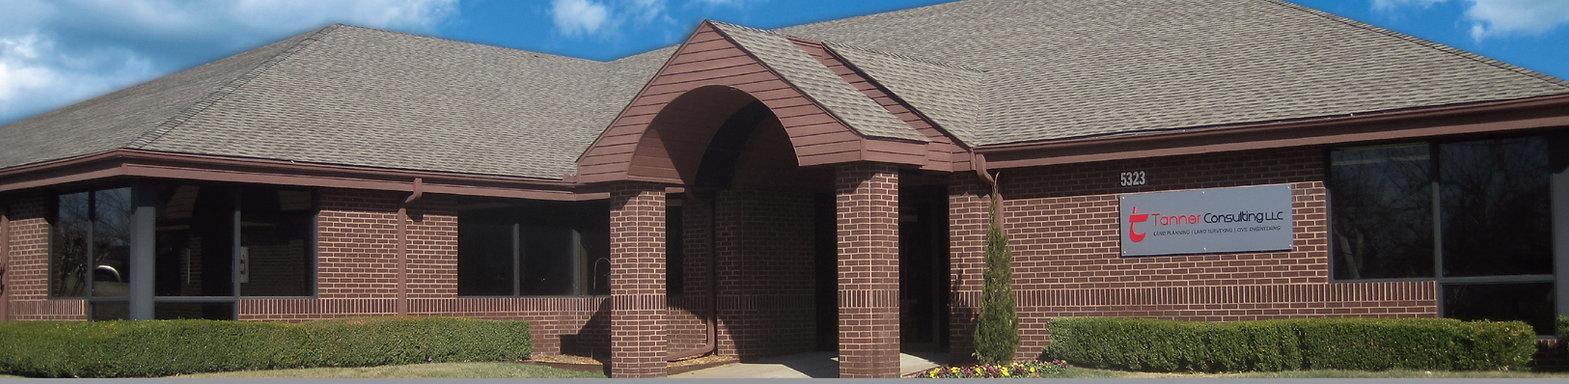 Tanner Office Building Photo.jpg